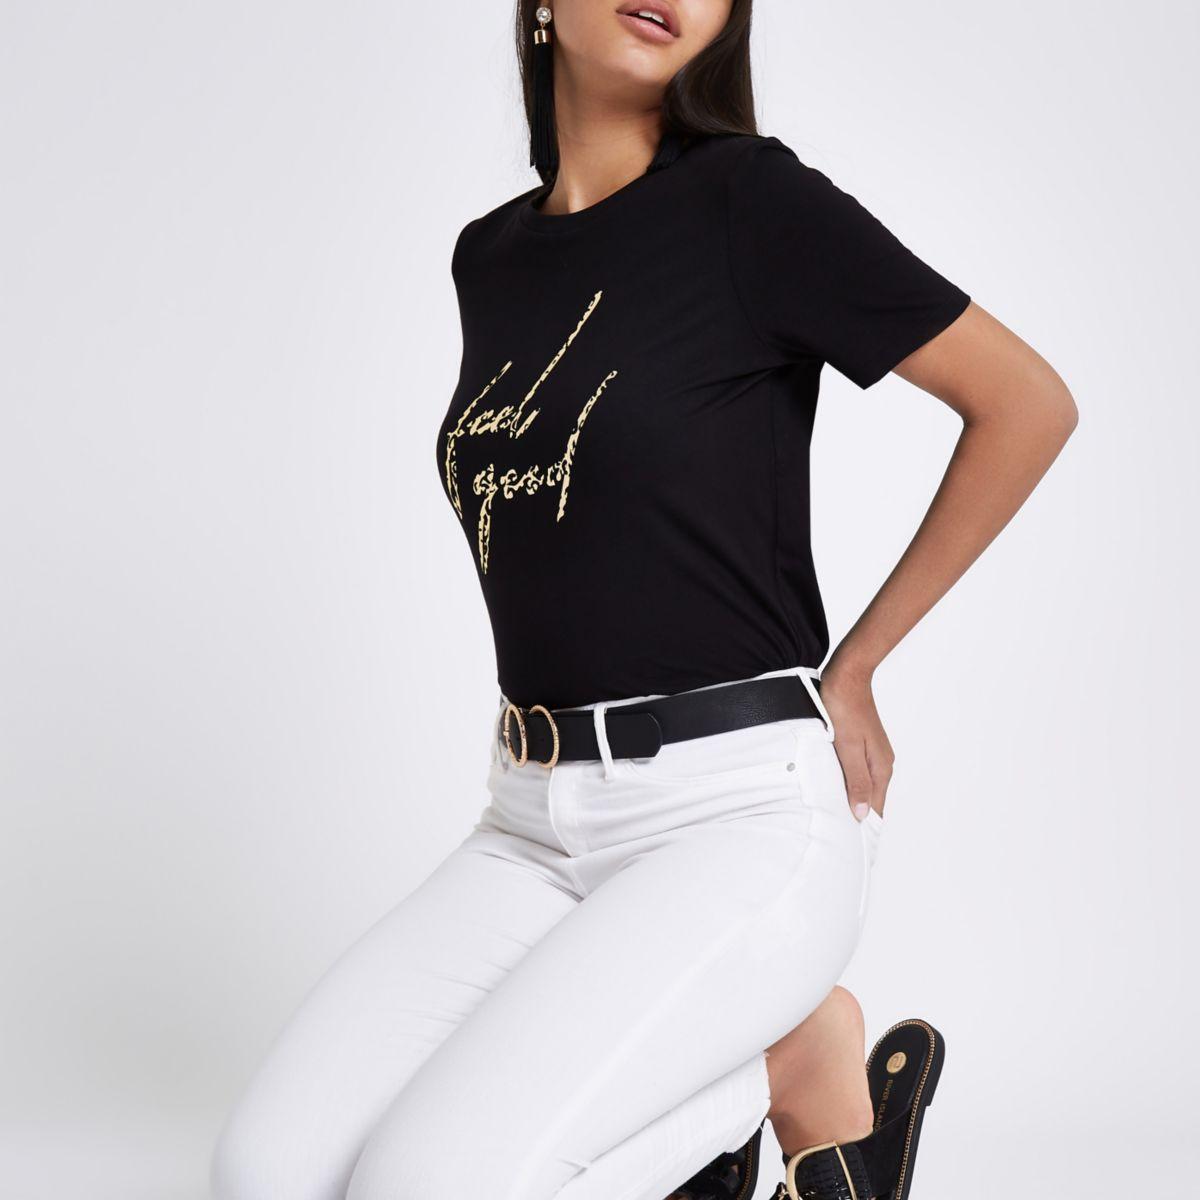 T-shirt noir imprimé « feel good » léopard